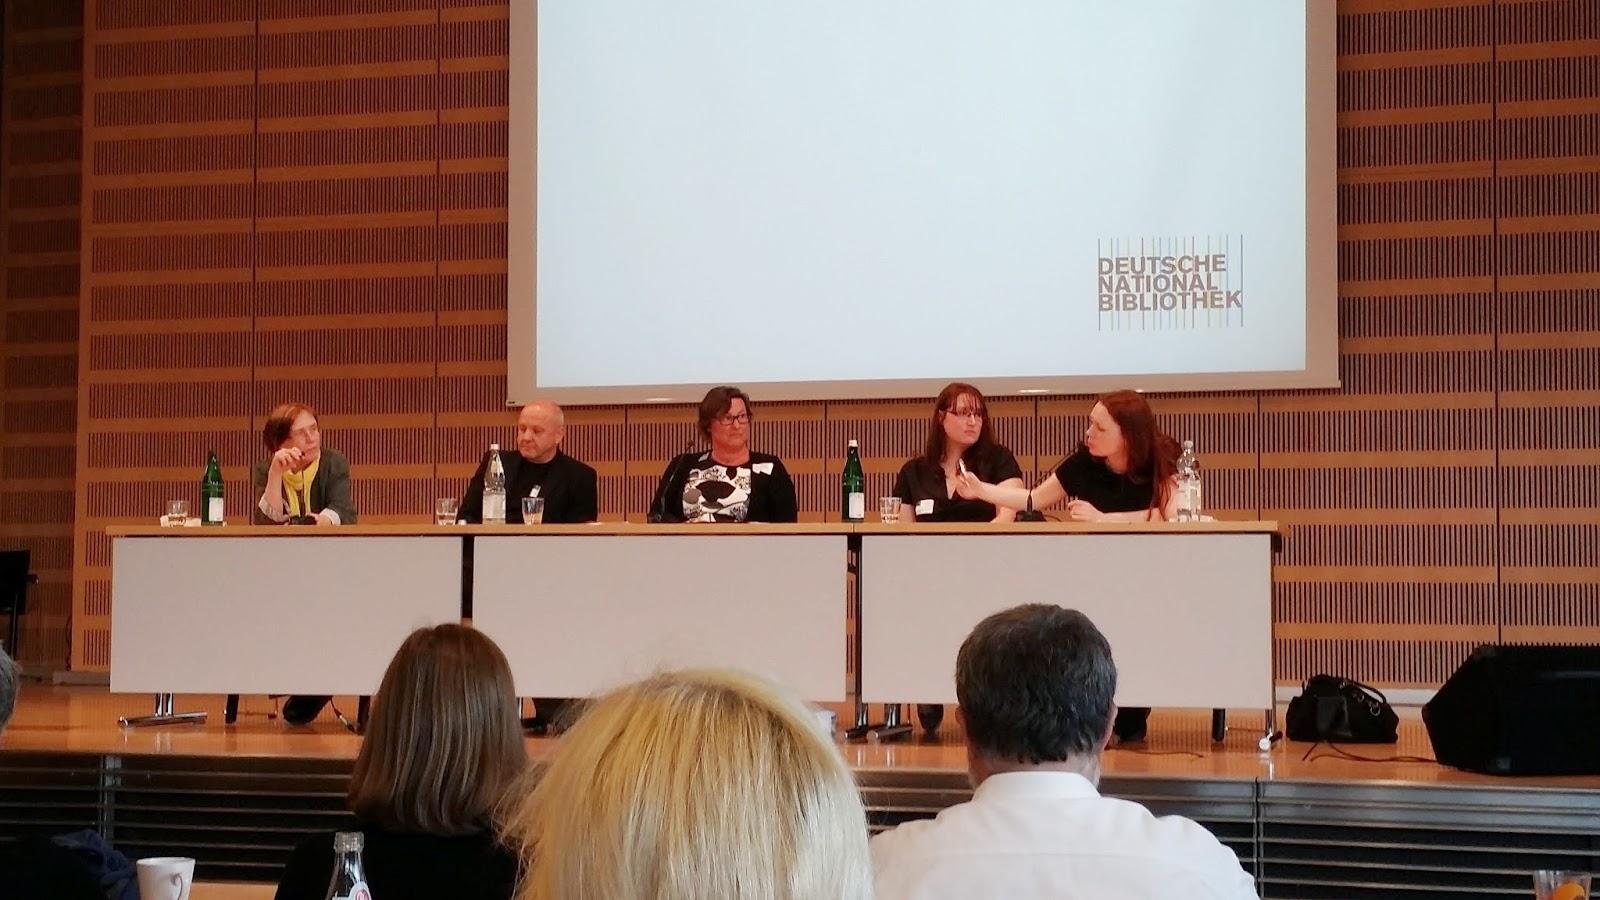 Jutta Wilkesmann, Uli Deurer, Diane Kopp, Daniela Müller, Zoe Beck